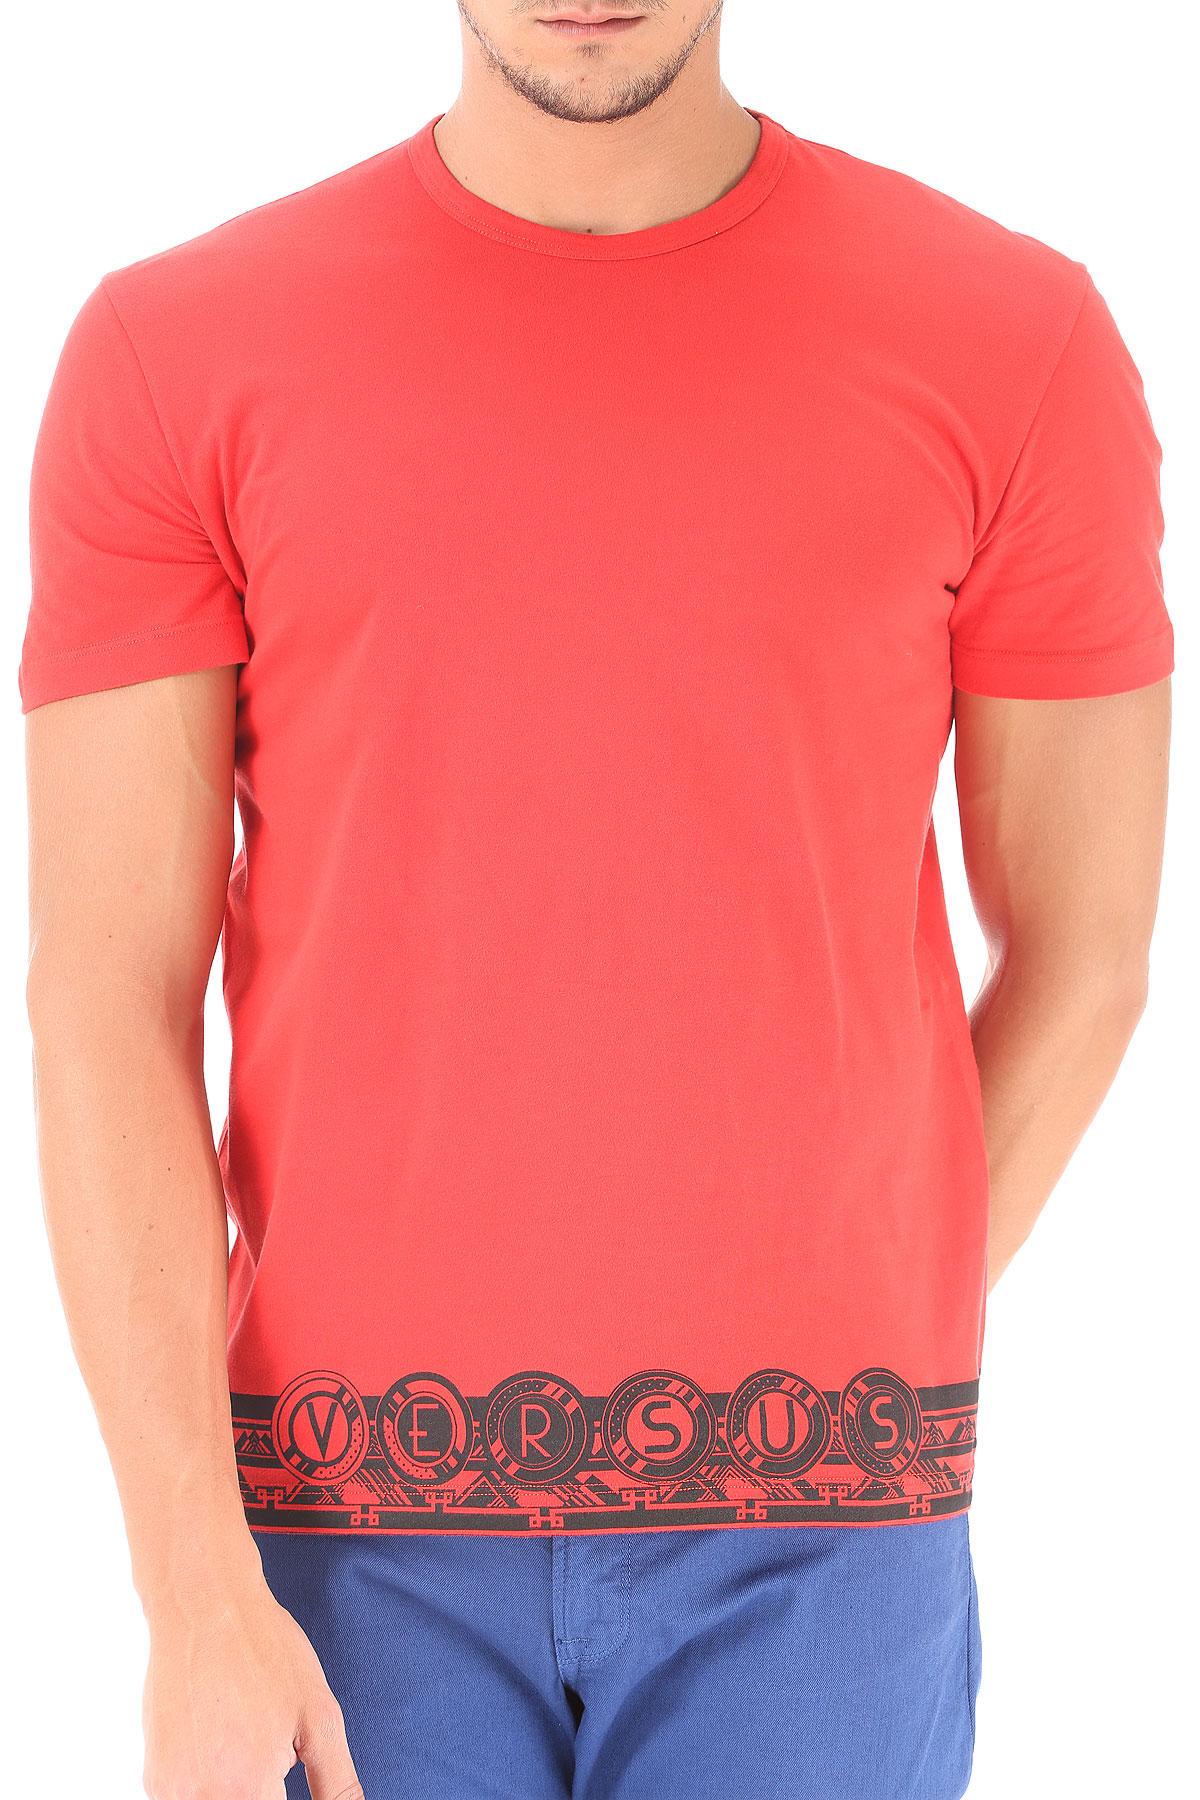 Mens clothing versace style code bu90104 bj20457 b7205 for Versace style shirt mens